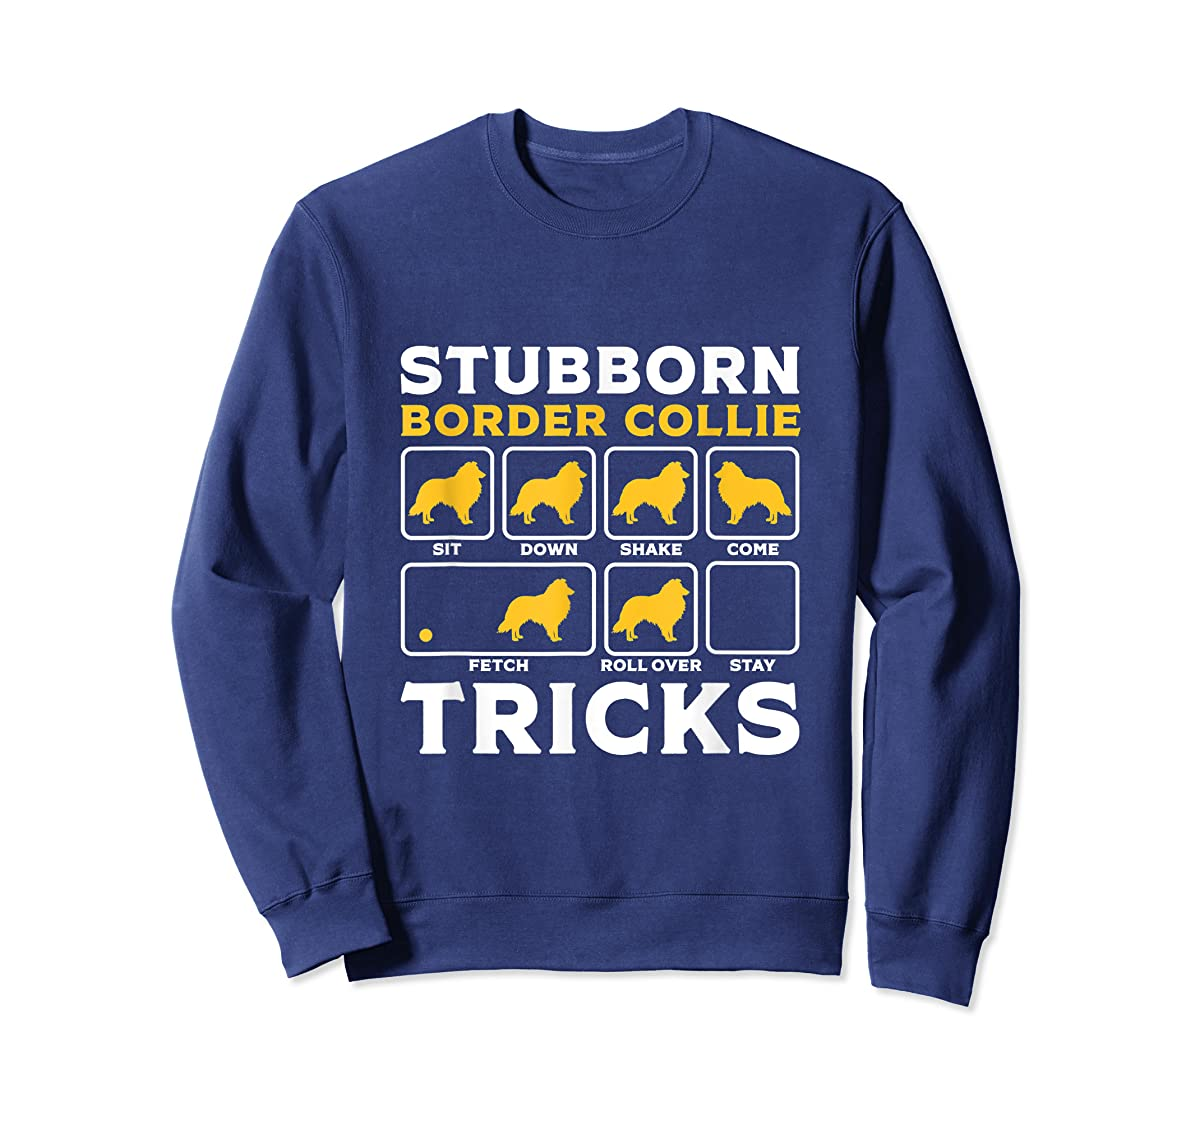 Border Collie Shirt for Women Men Dog Lover Gift Cute Dogs-Sweatshirt-Navy